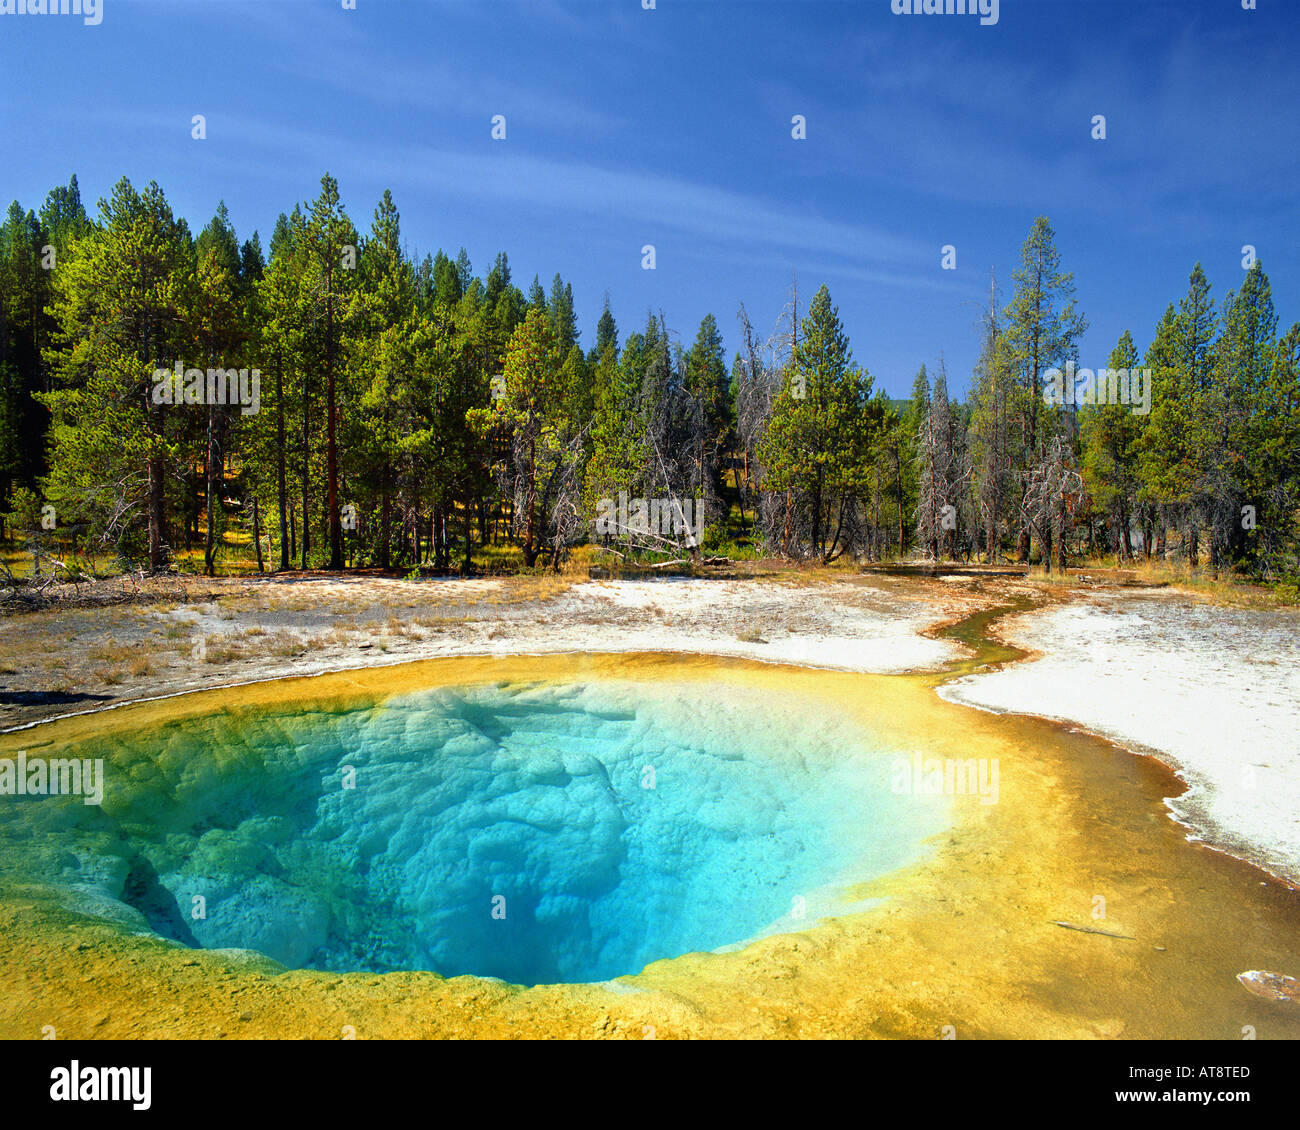 Stati Uniti - Wyoming: gloria di mattina in piscina a Yellowstone Nat. Park Immagini Stock